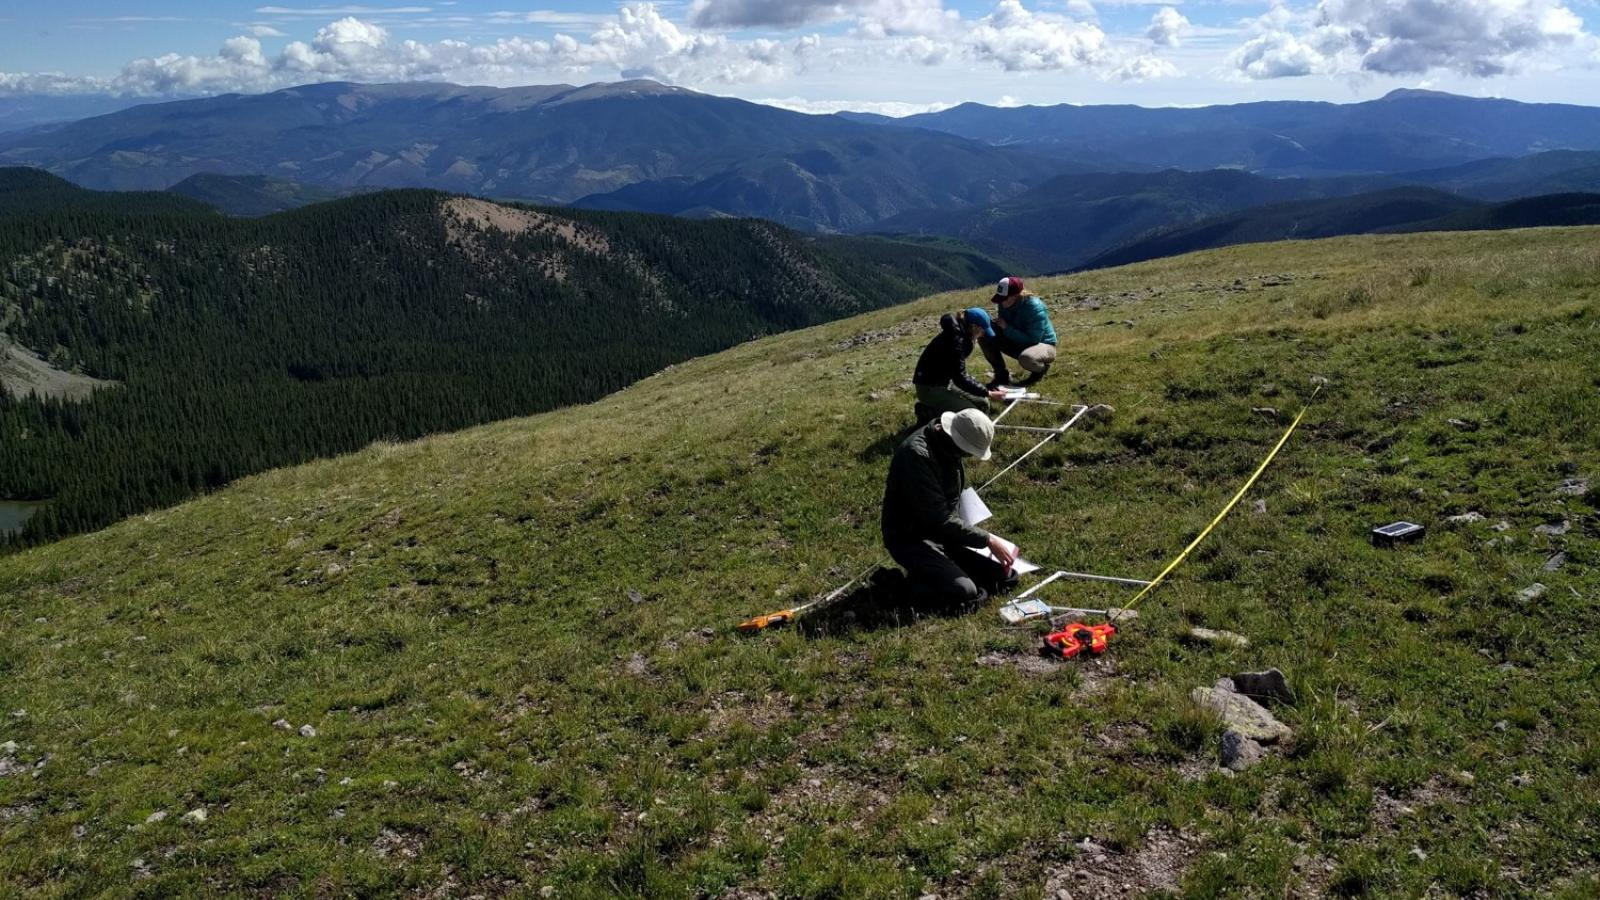 AK fieldwork